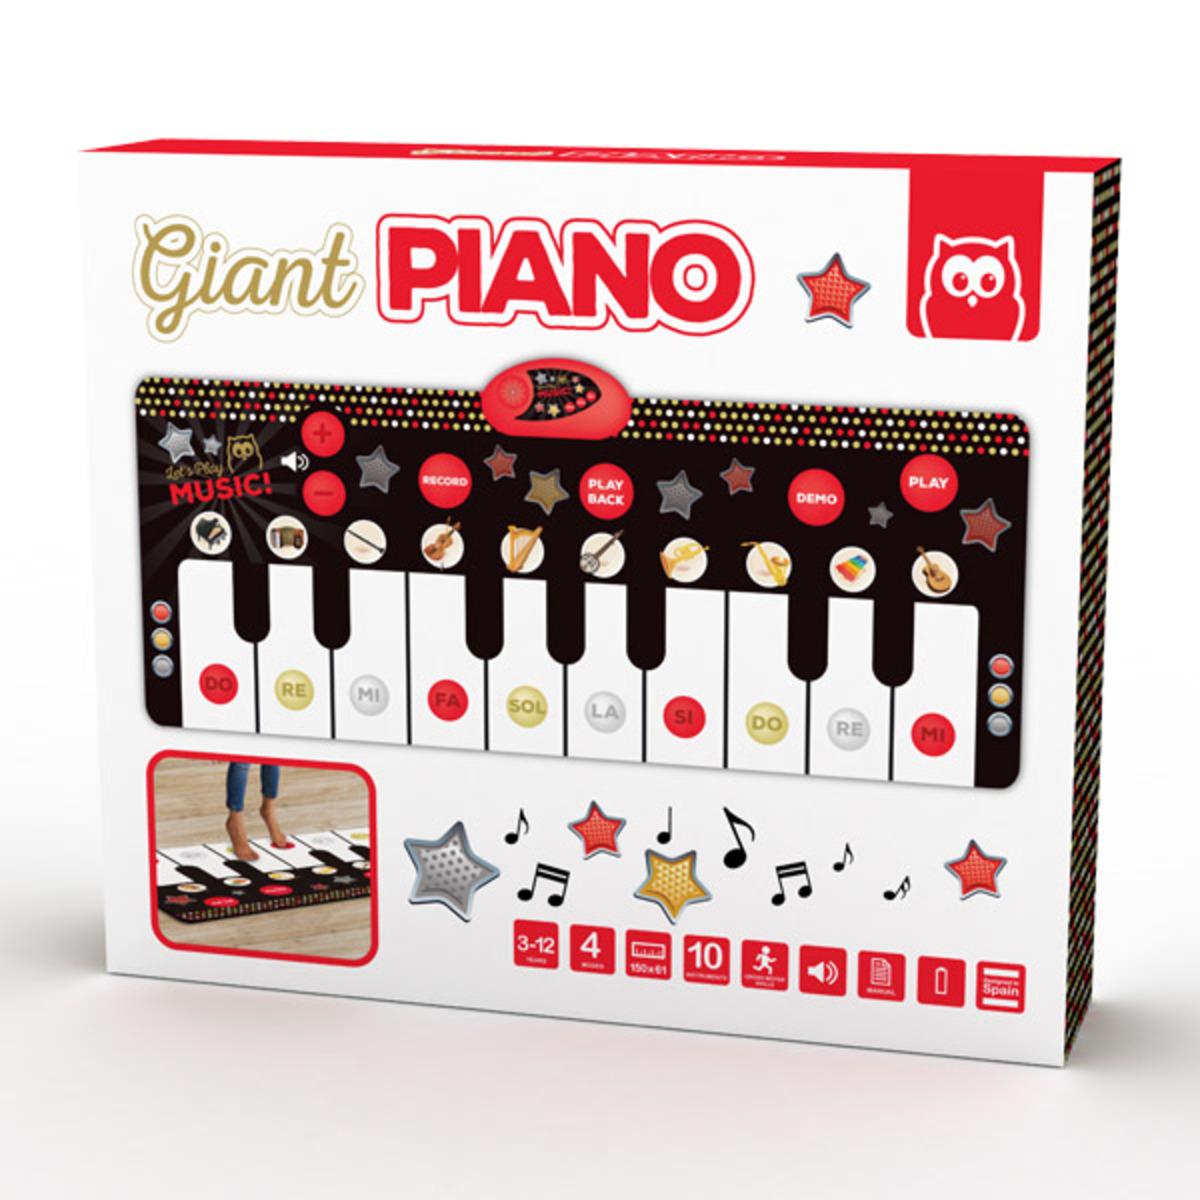 Giant Piano Playmatt